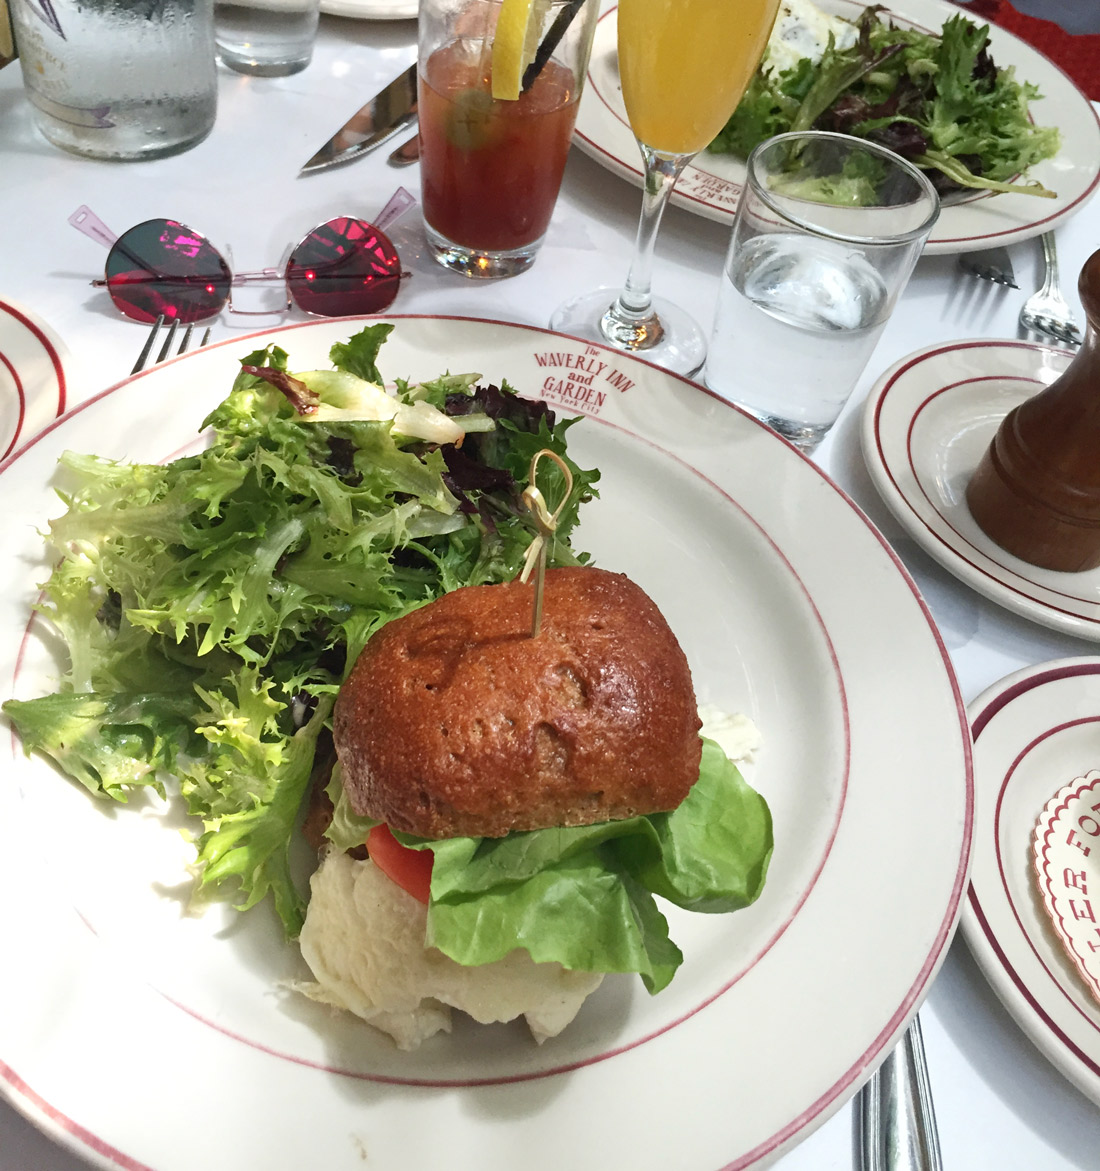 Bag-at-you---Travel-blog---New-York---Waverly-Inn---Brunch